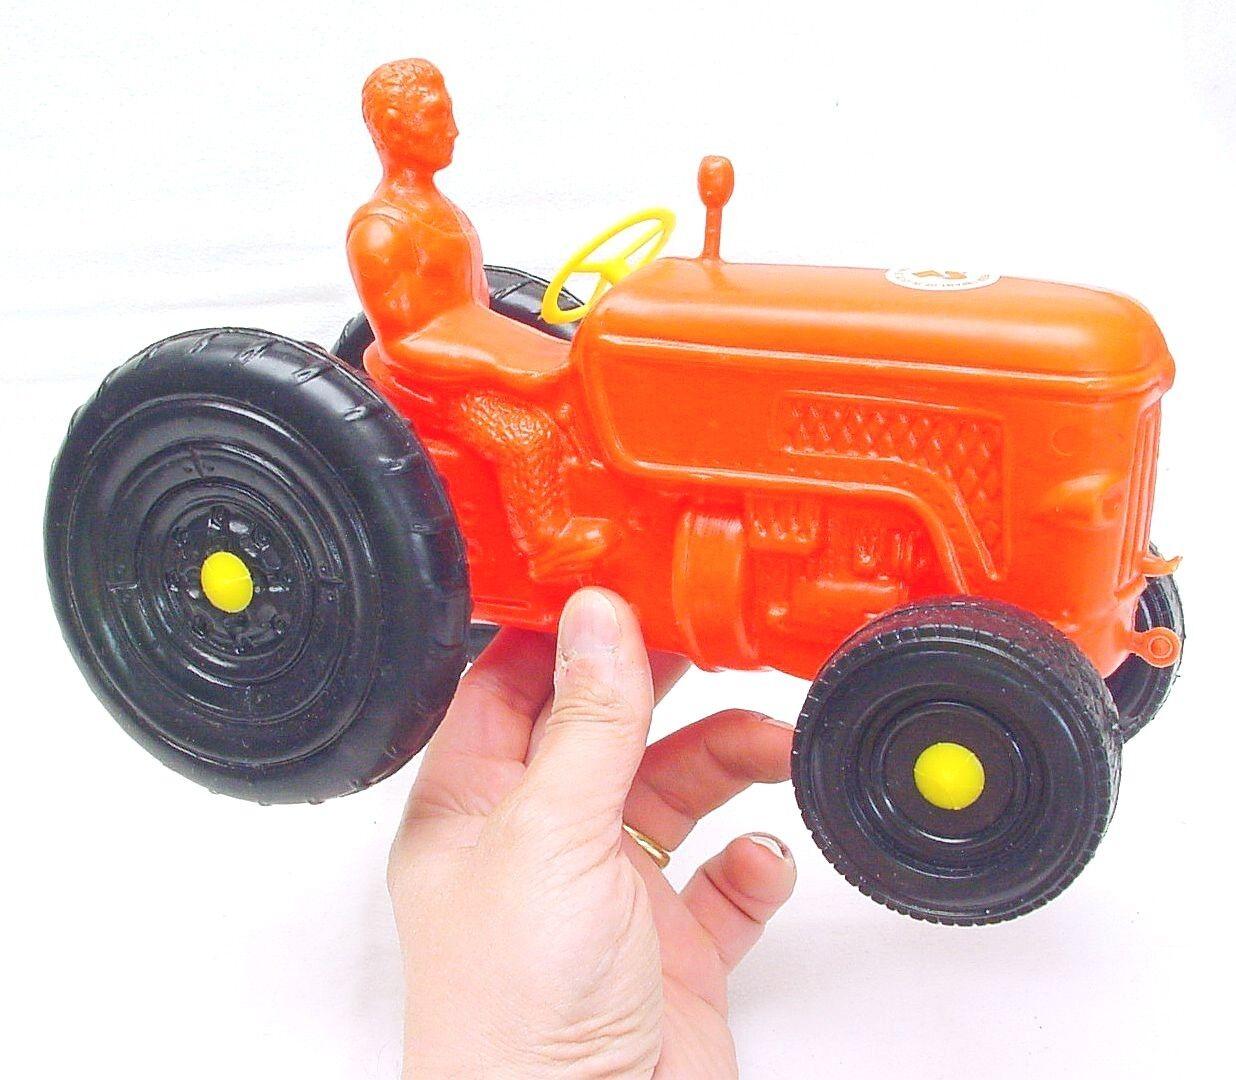 AS Jouet France Toys Plastic Plastic Plastic FENDT FARMER TRACTOR Blow Molded Mint 1967 RARE  7744a3